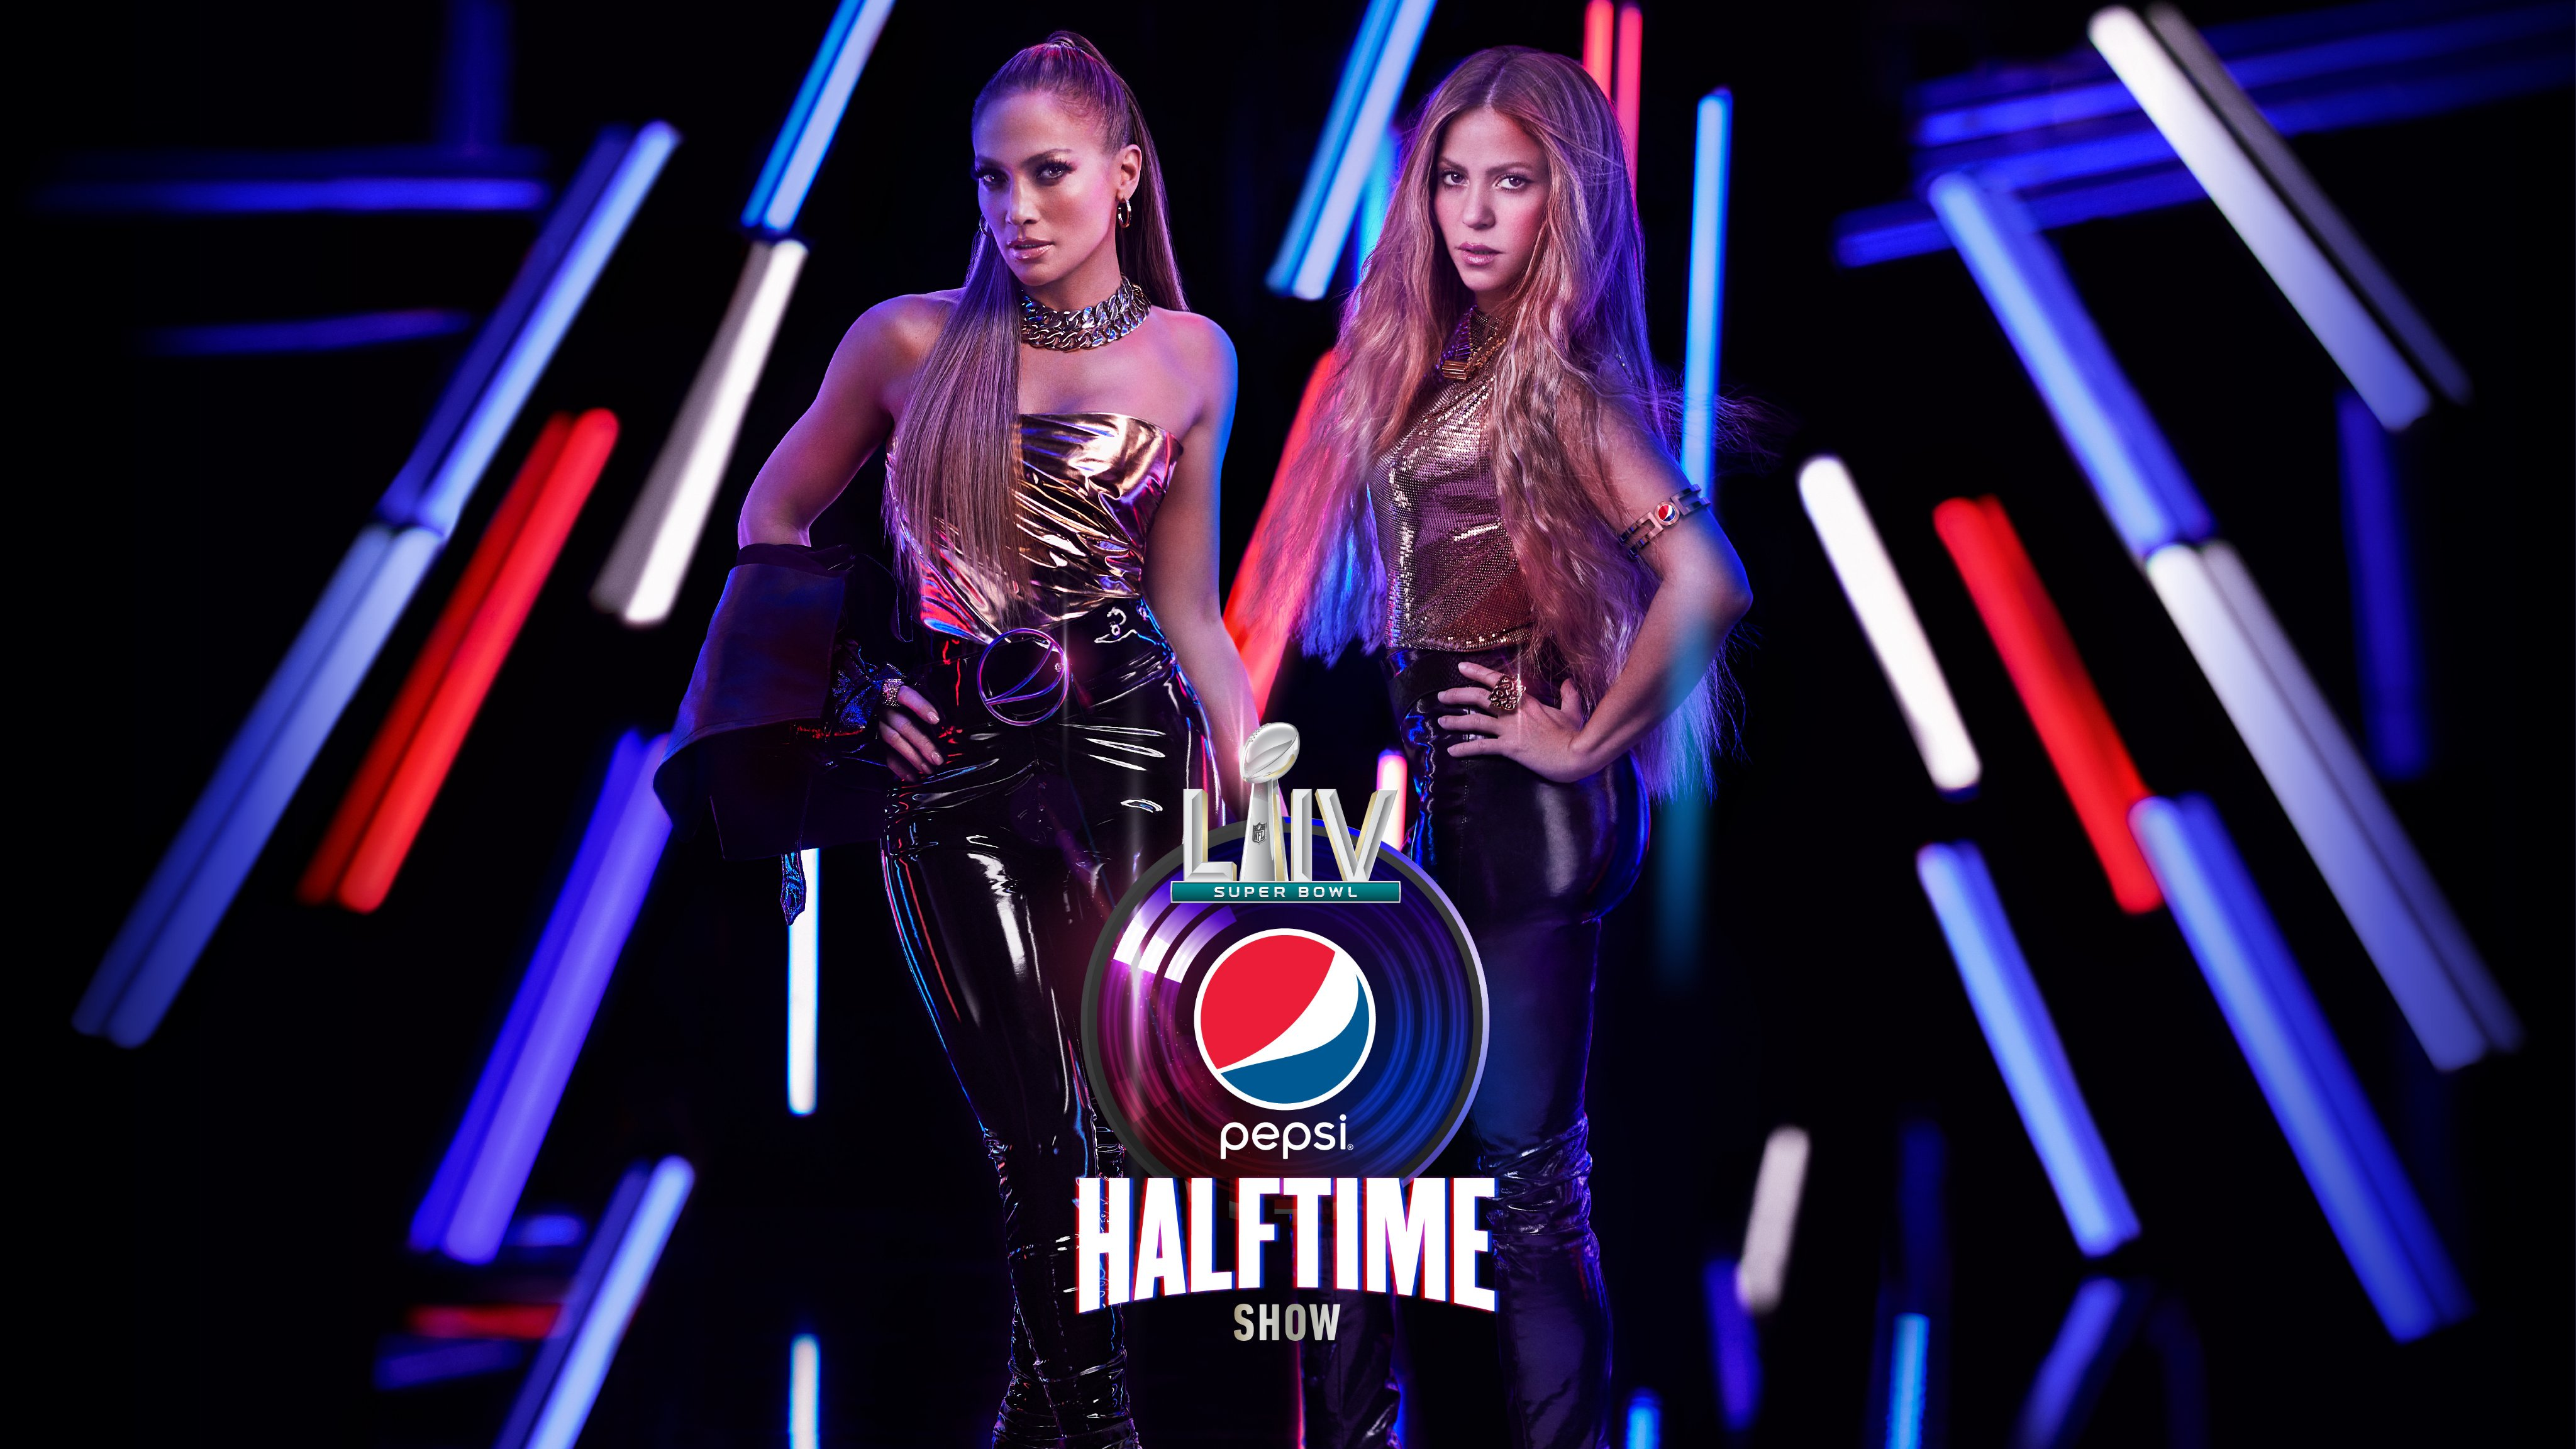 Jennifer Lopez, Shakira headline Super Bowl LIV halftime show